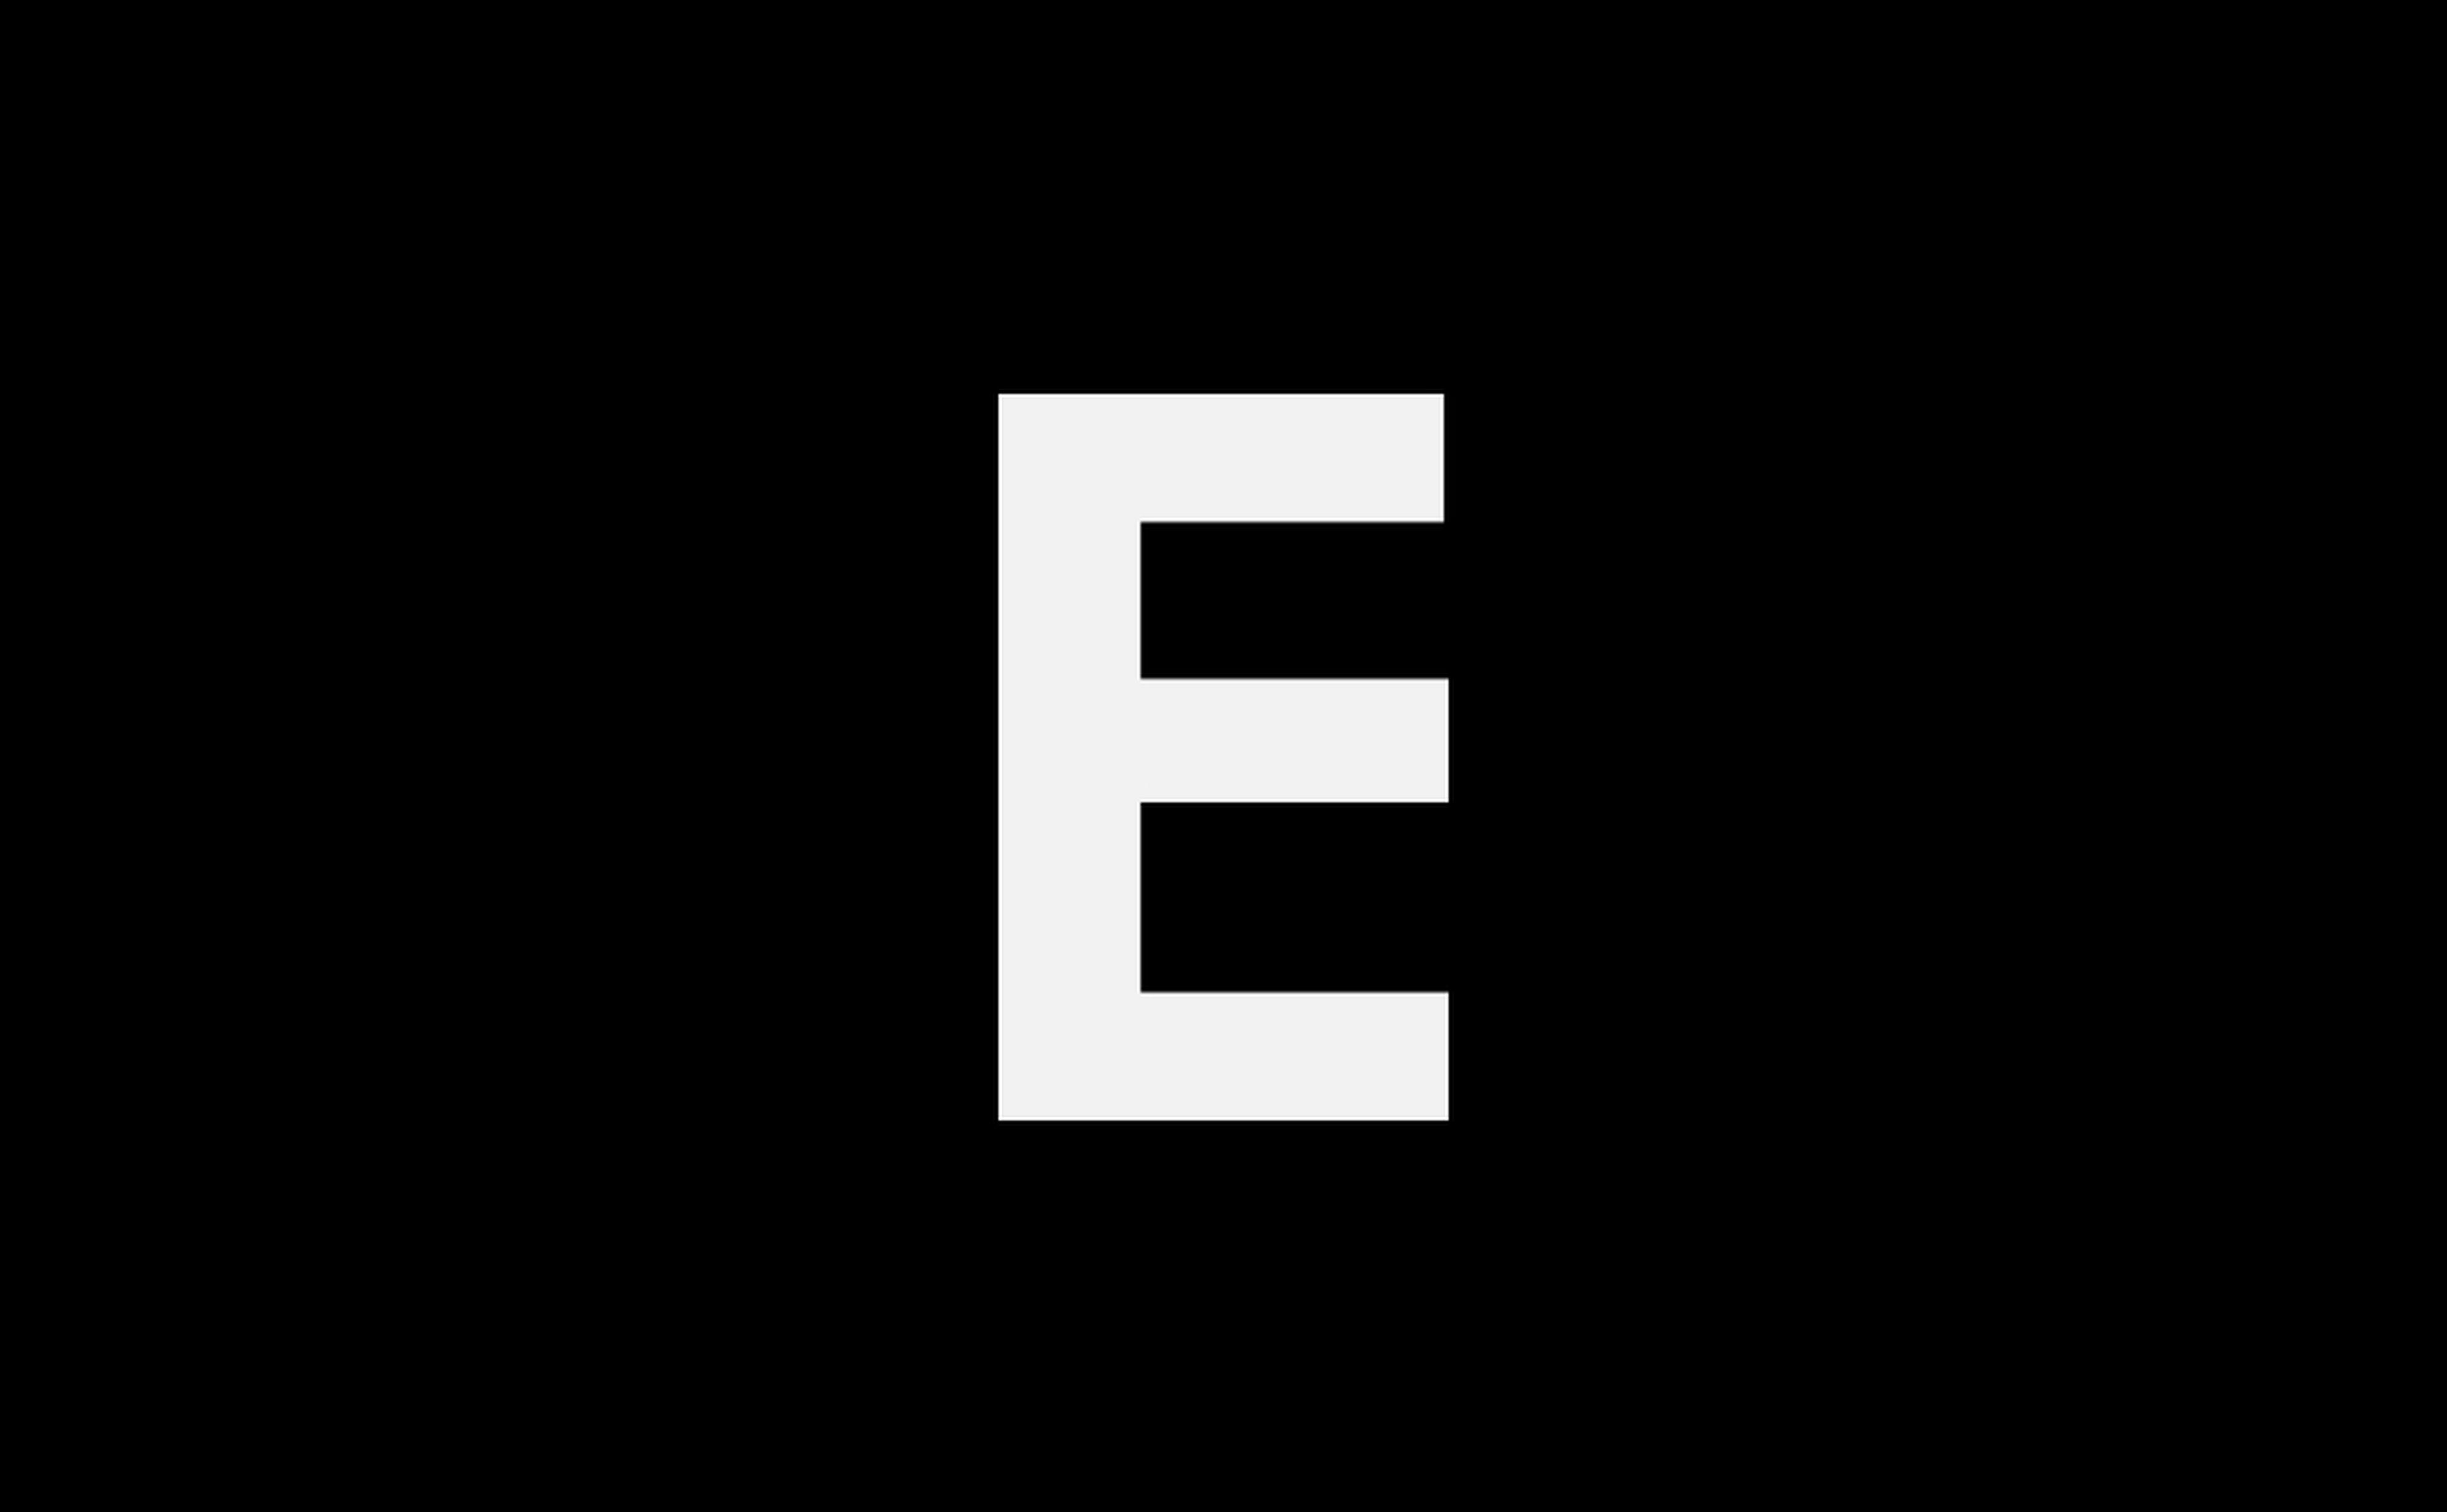 text, western script, communication, indoors, night, sign, capital letter, illuminated, dark, non-western script, guidance, wall - building feature, close-up, information, information sign, wall, no people, blue, graffiti, human representation